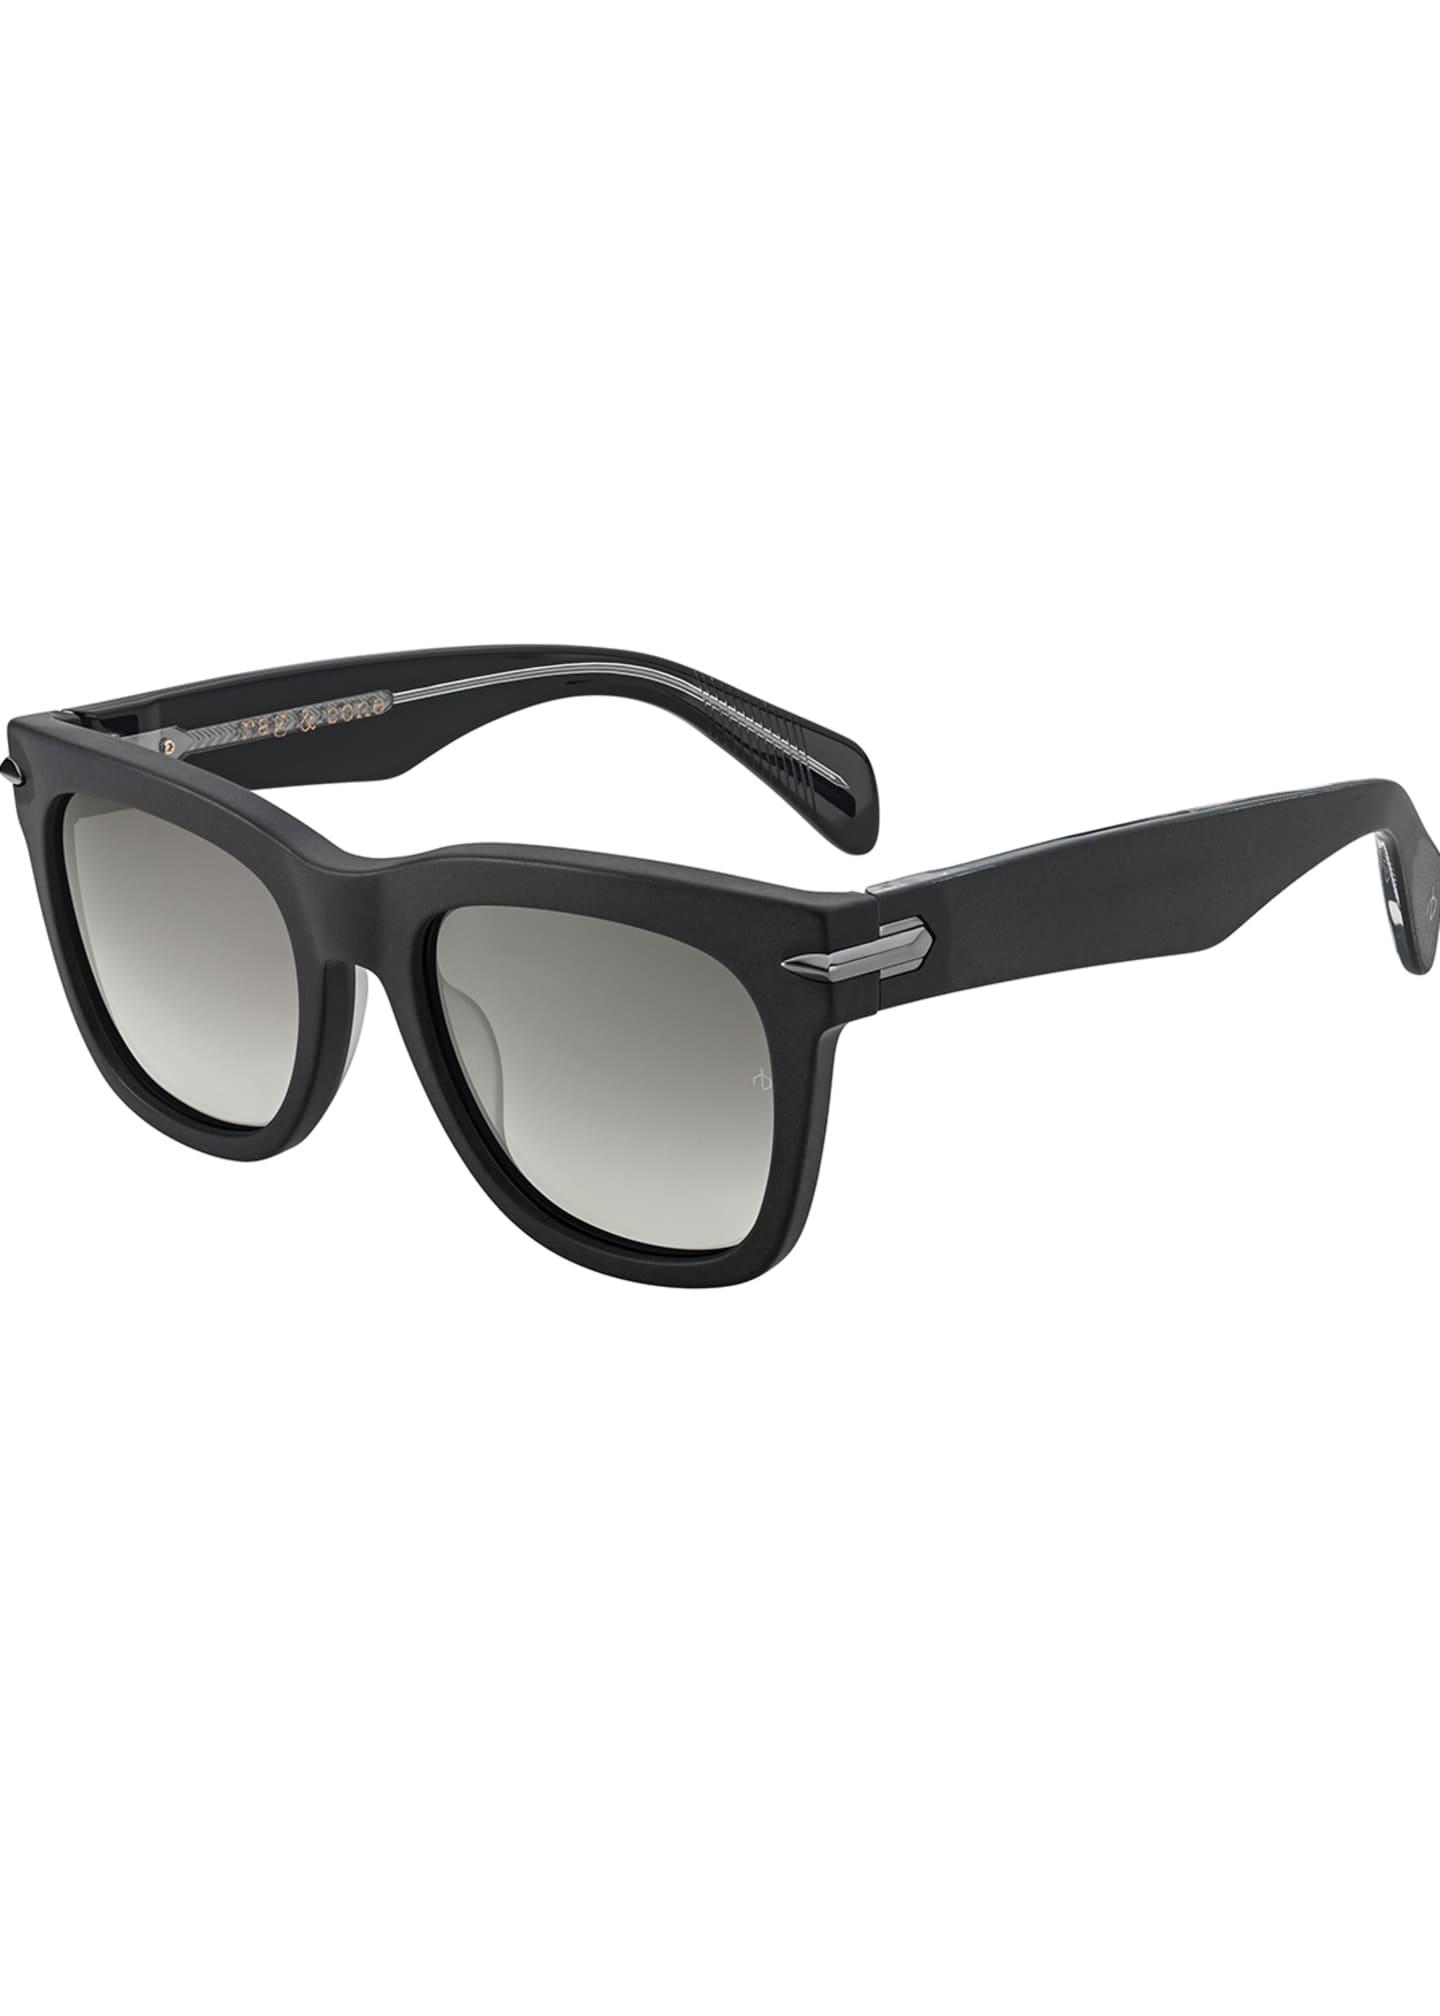 Rag & Bone Polarized Round Acetate Sunglasses w/